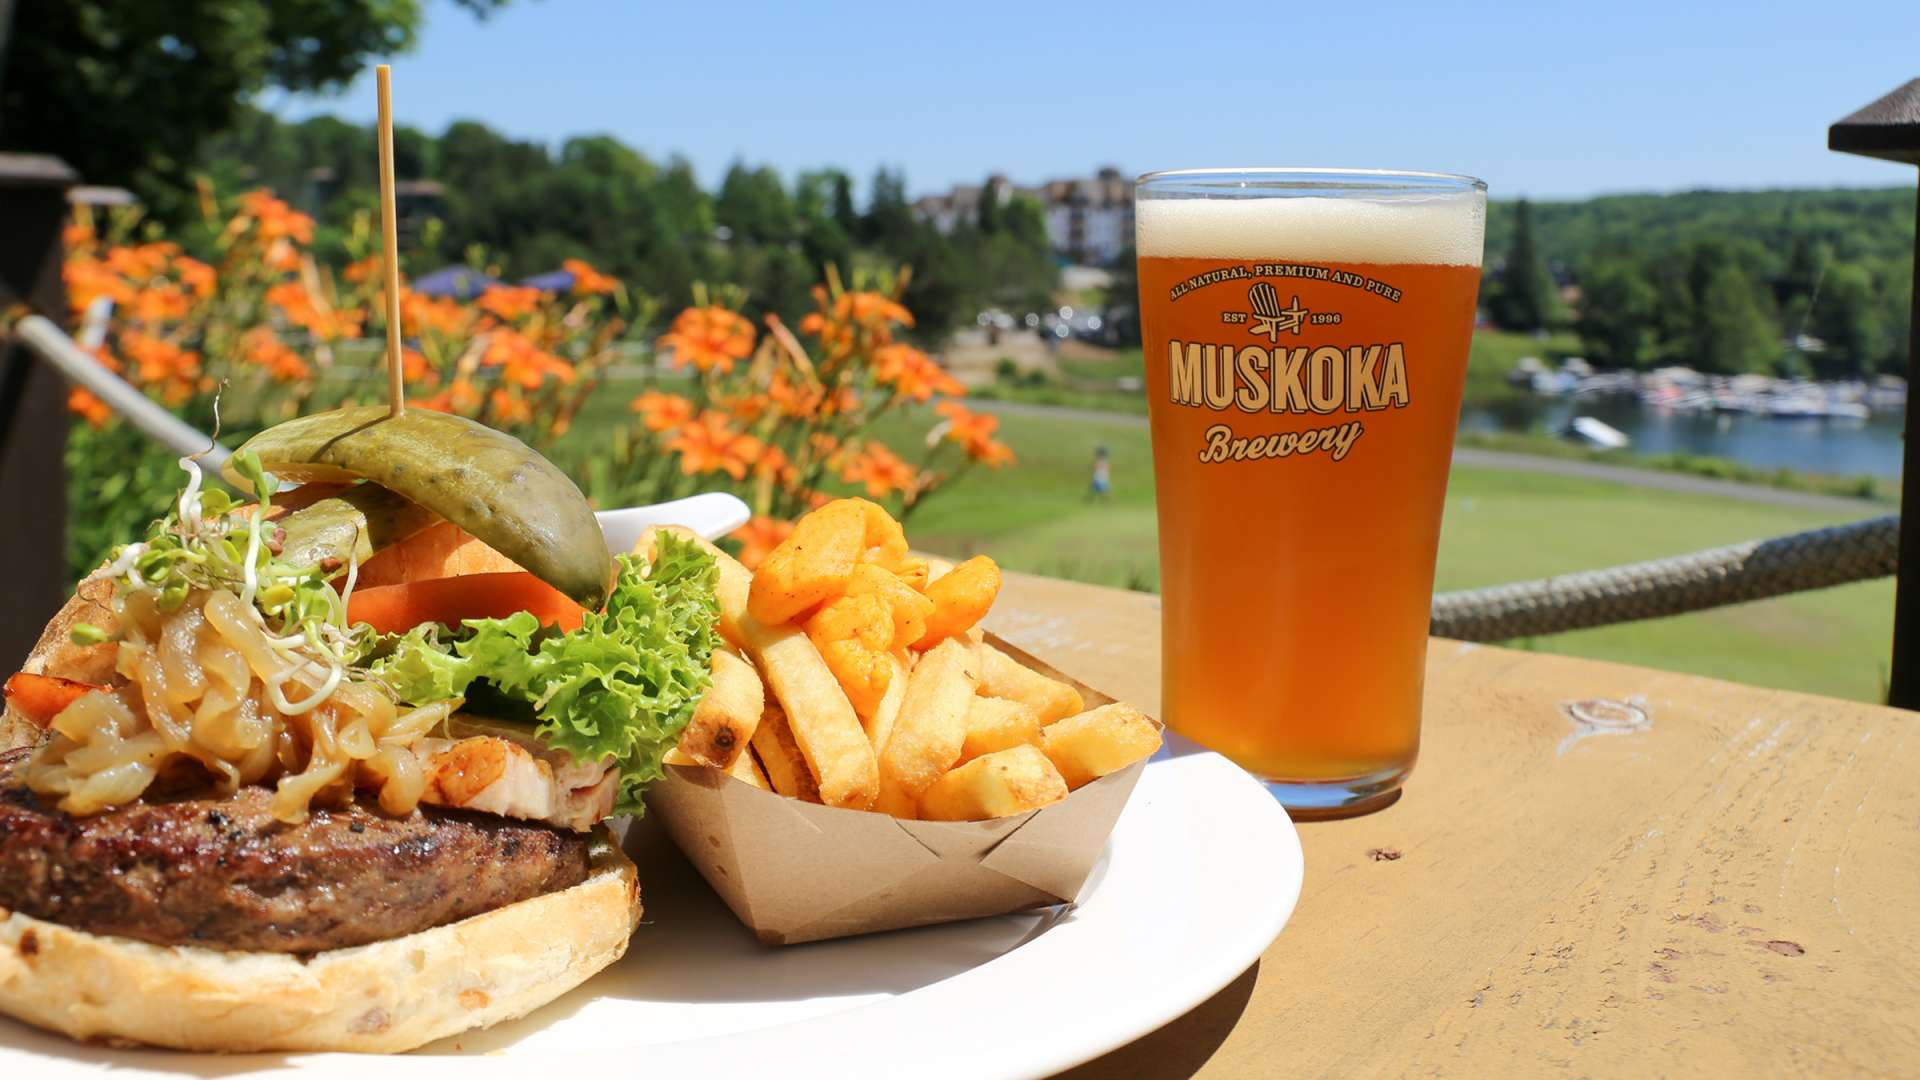 Food Pairing with Muskoka Brewery